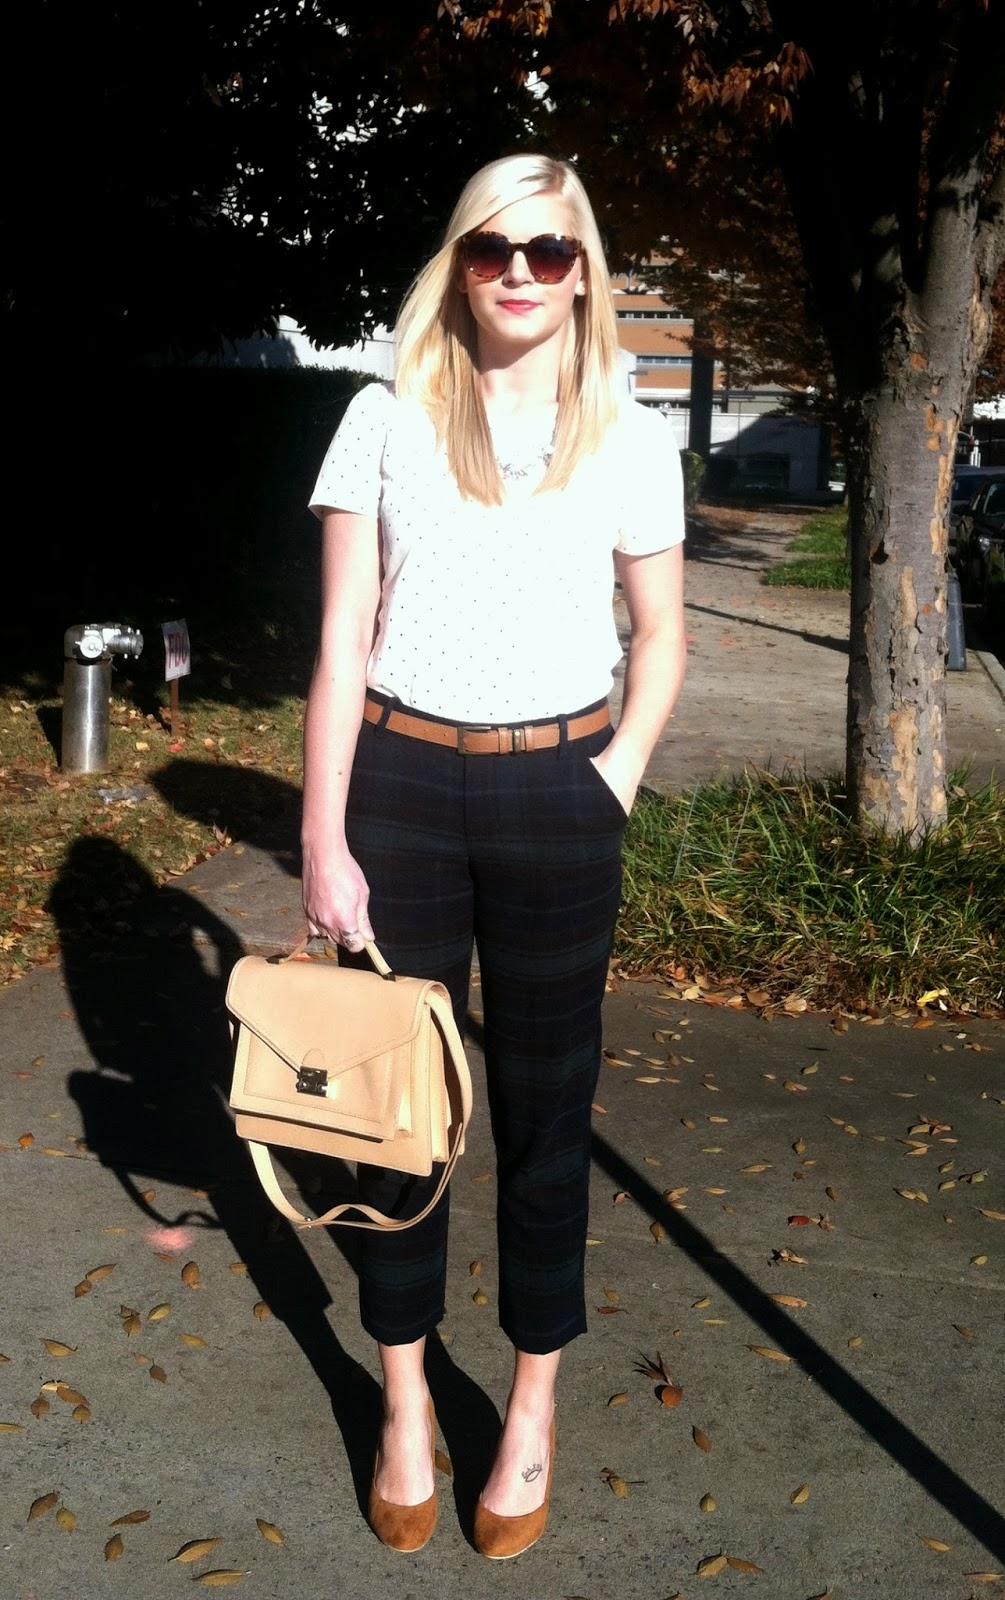 Pants Very Similar Loeffler Randall Rider Bag C O Eluxe Via Her Waise